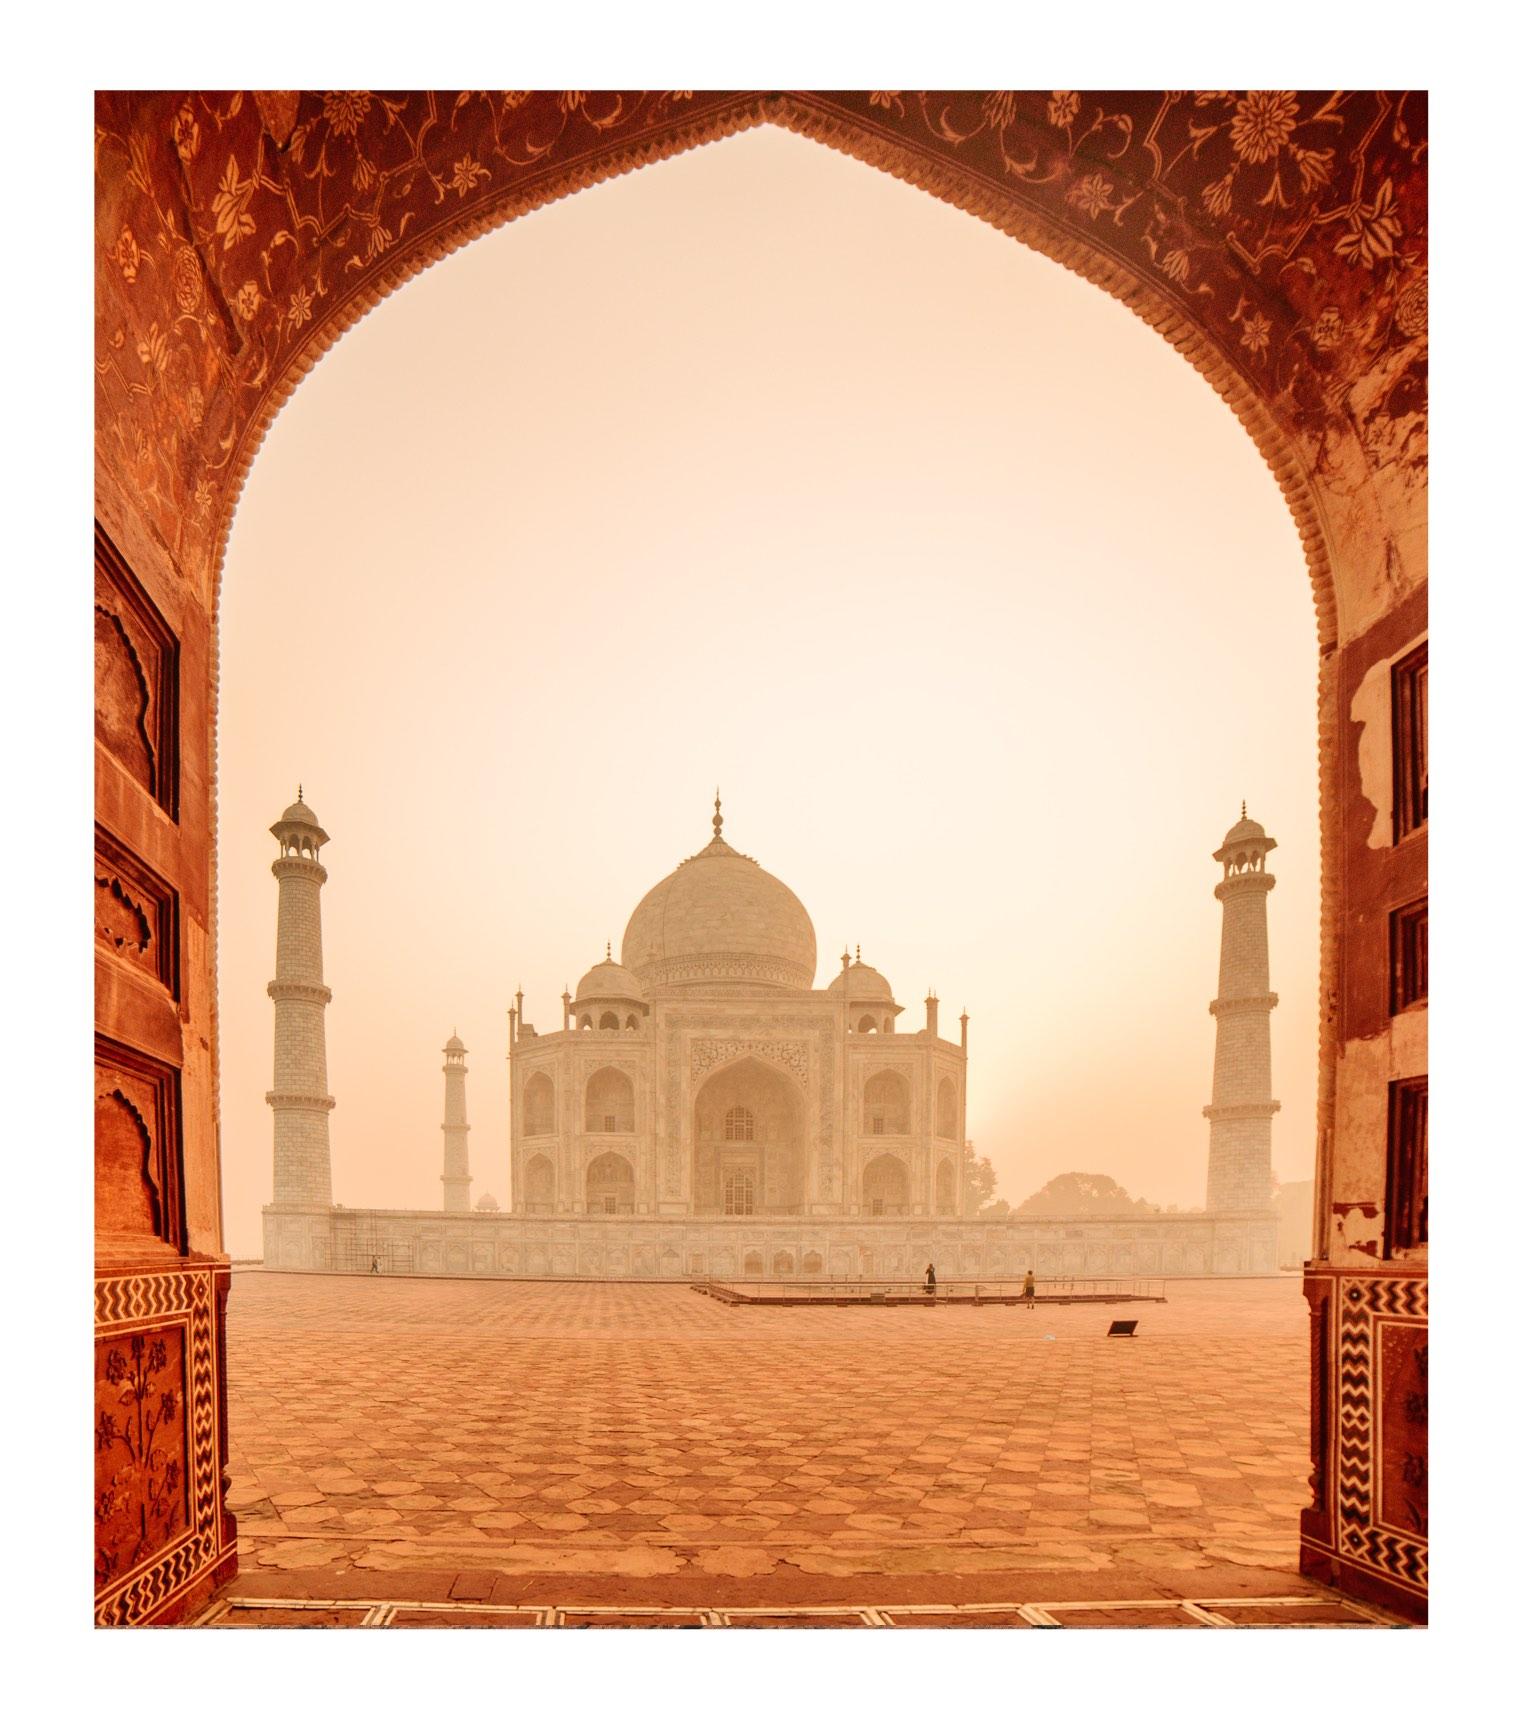 Índia - Pessoas, Cores, Desertos, Templos Clássicos e Espiritualidade